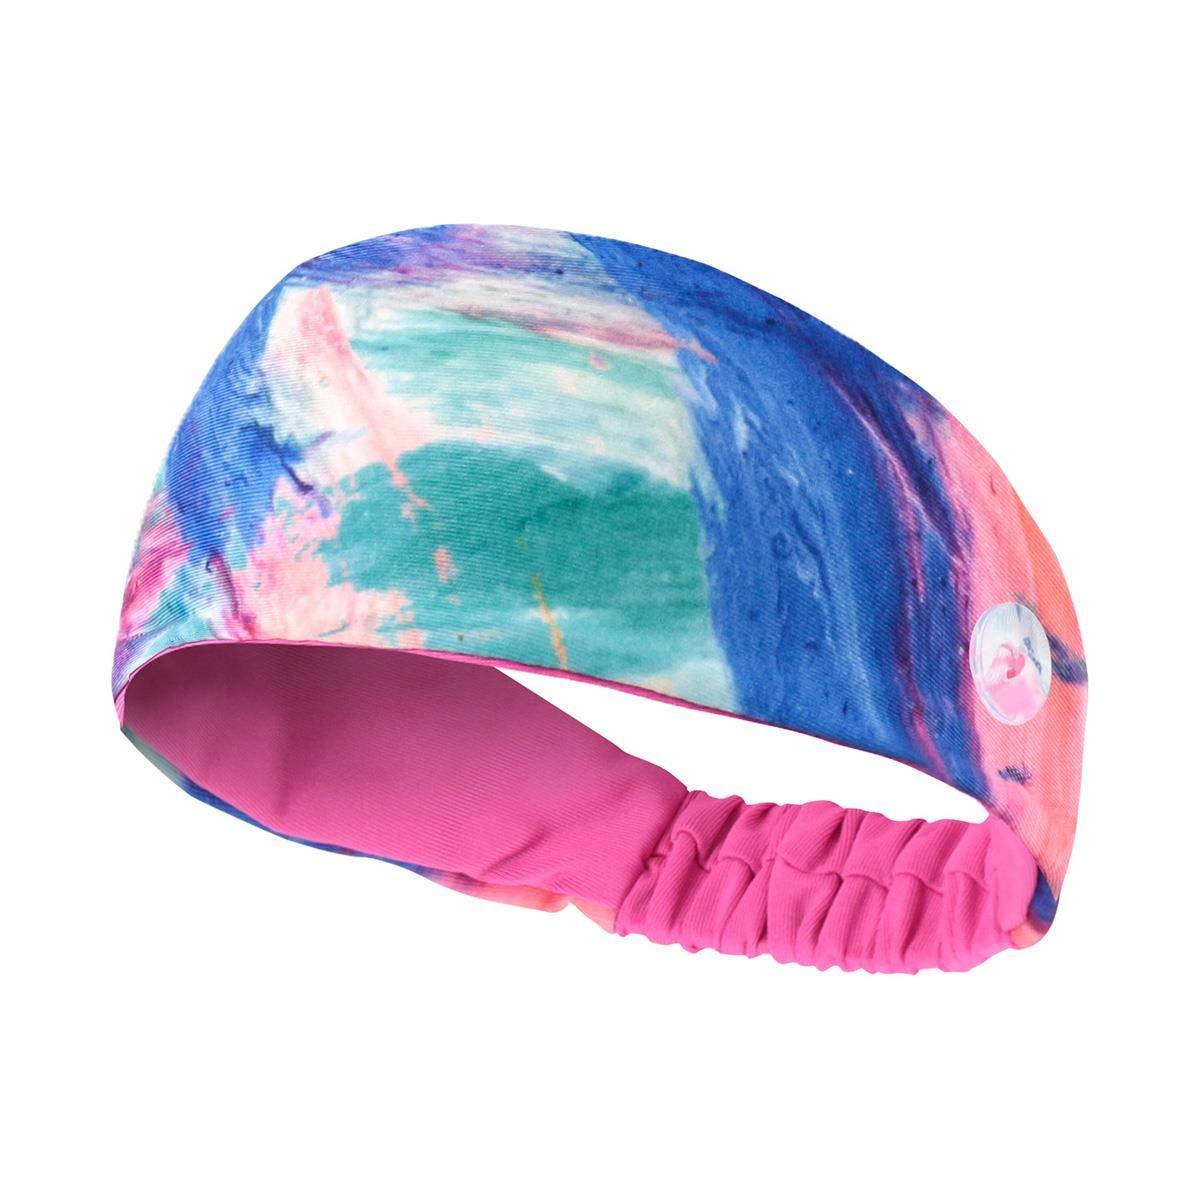 Sweatband Buttons Headband for Men Women Ear Protection Holder Yoga Sport Headband Moisture Wicking Fitness Workout Head Wrap Hair Sweat Band Elastic Non Slip Wide Turban Headwear for Outdoor Gym Pink